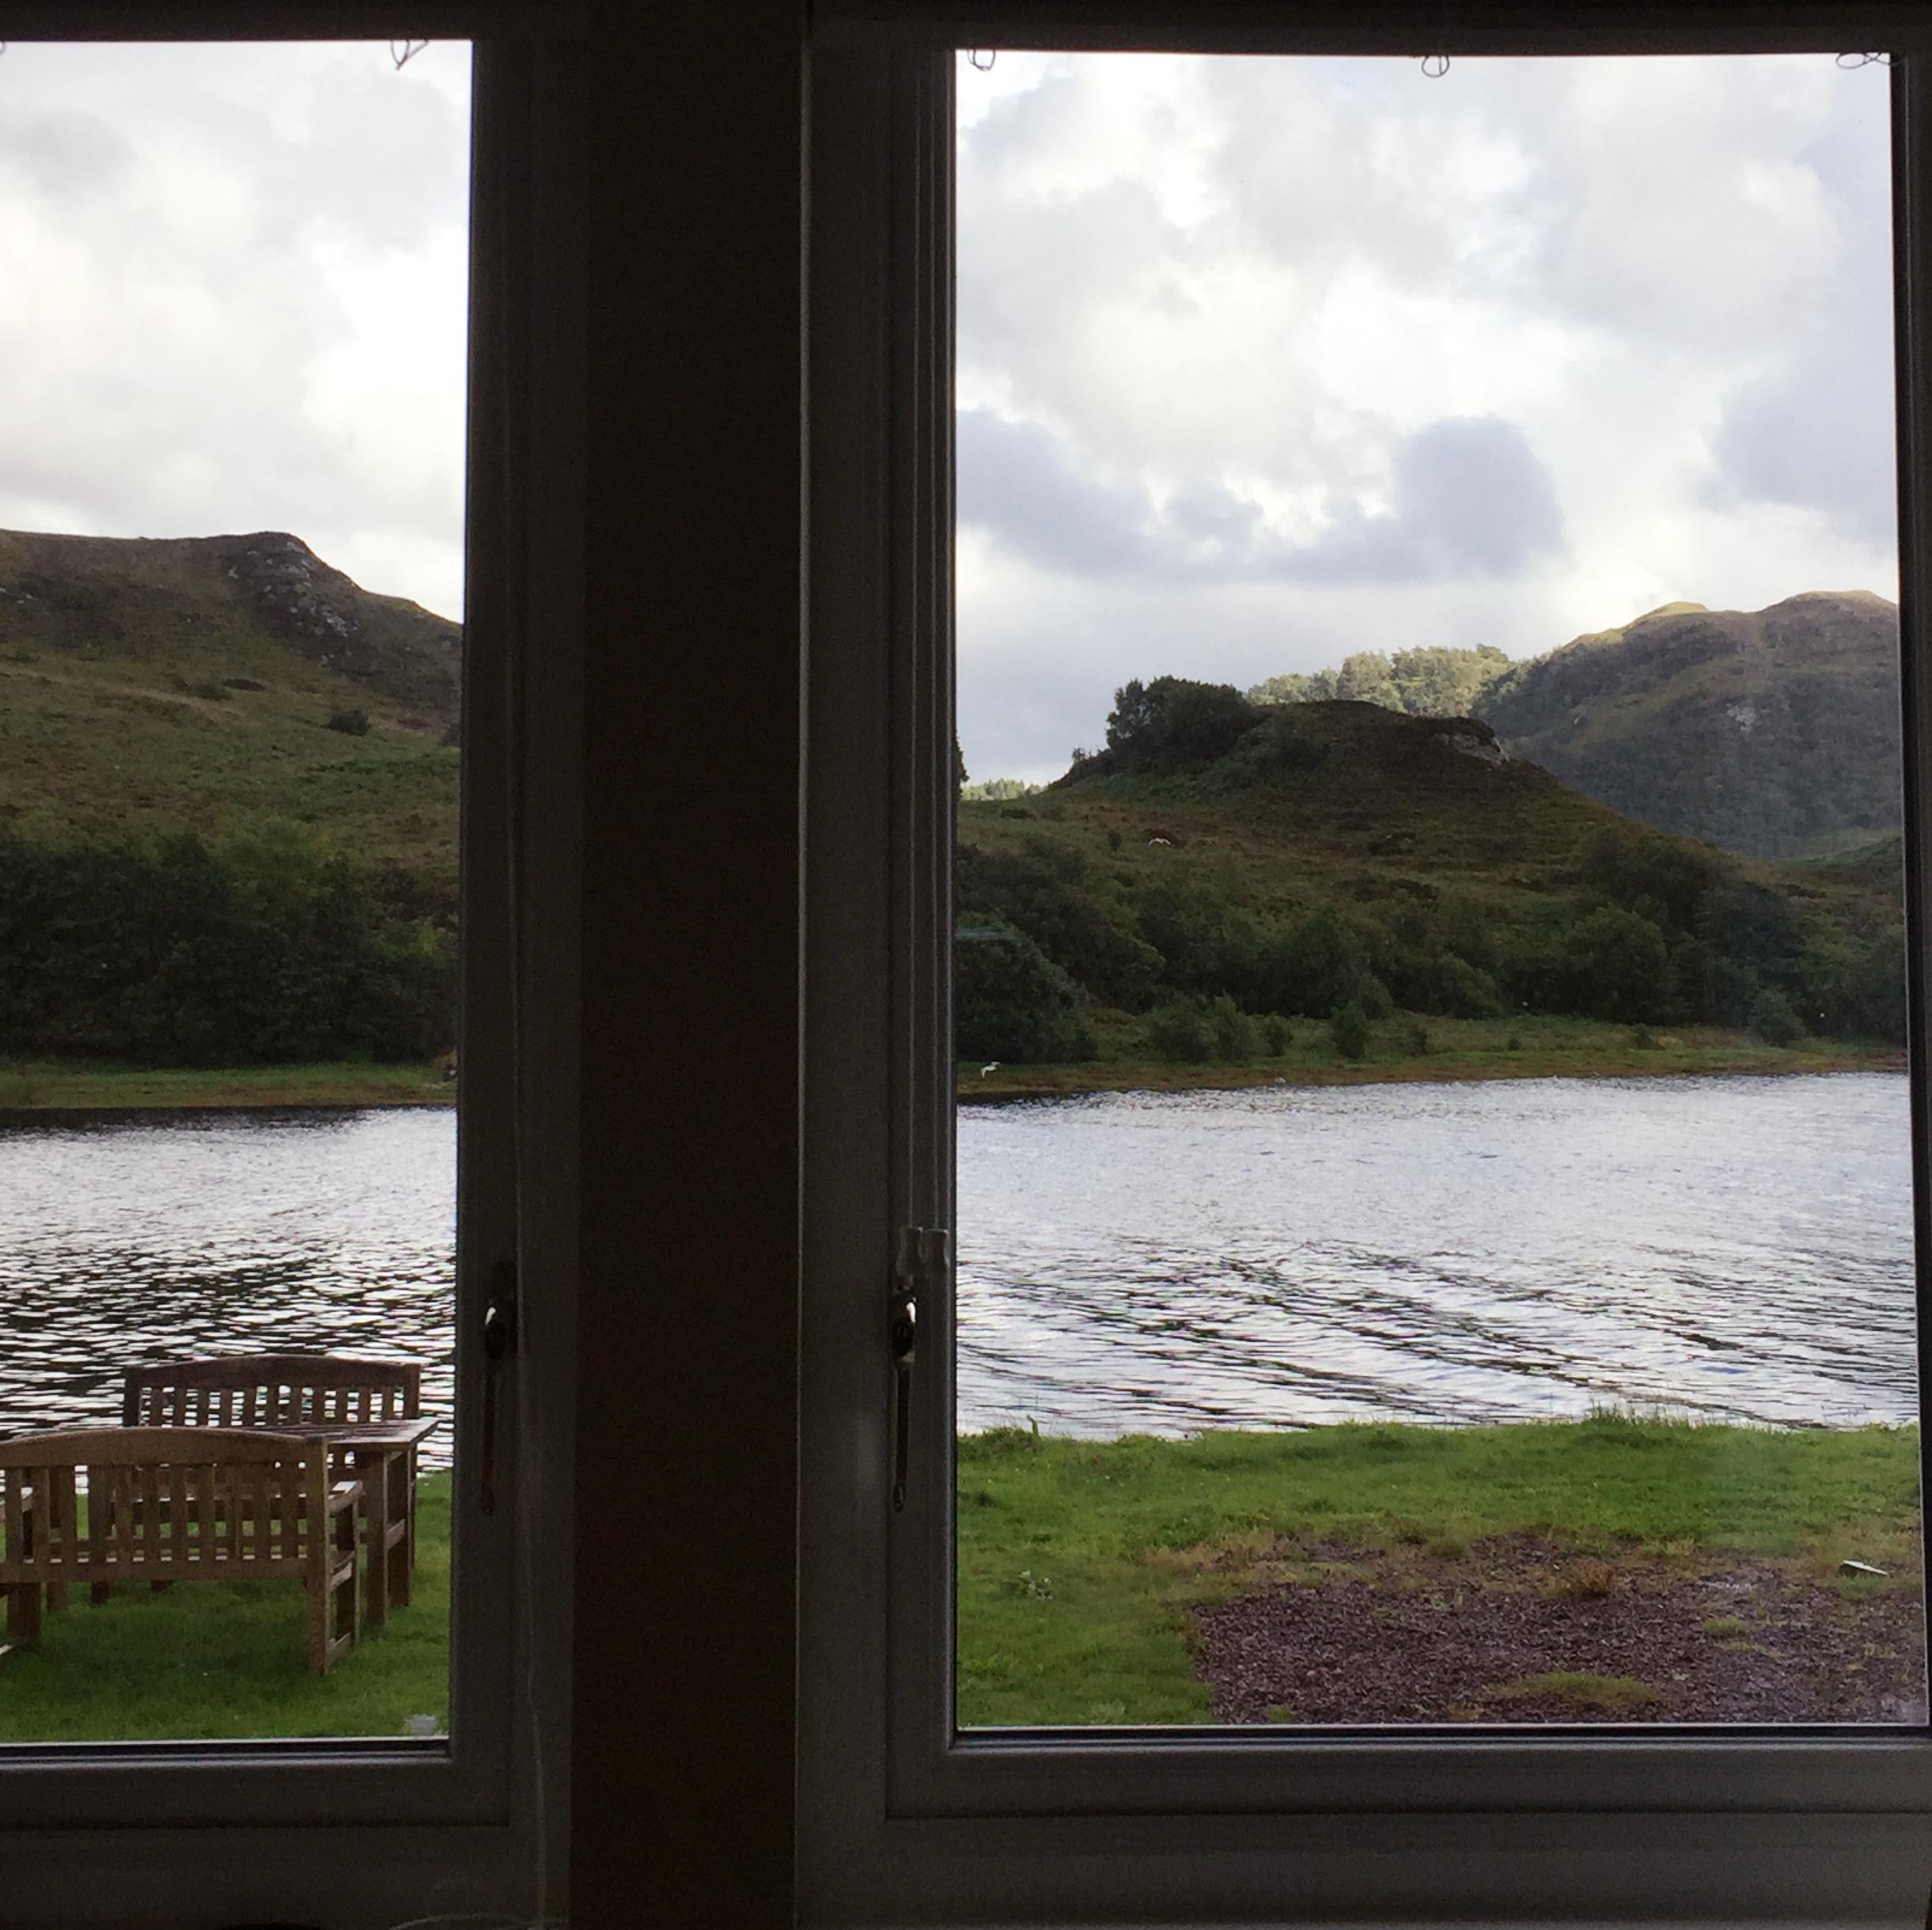 scotland, uk, my british summer, travel, roadtrip, photos and the city, dornie, highlands, eilean donan castle